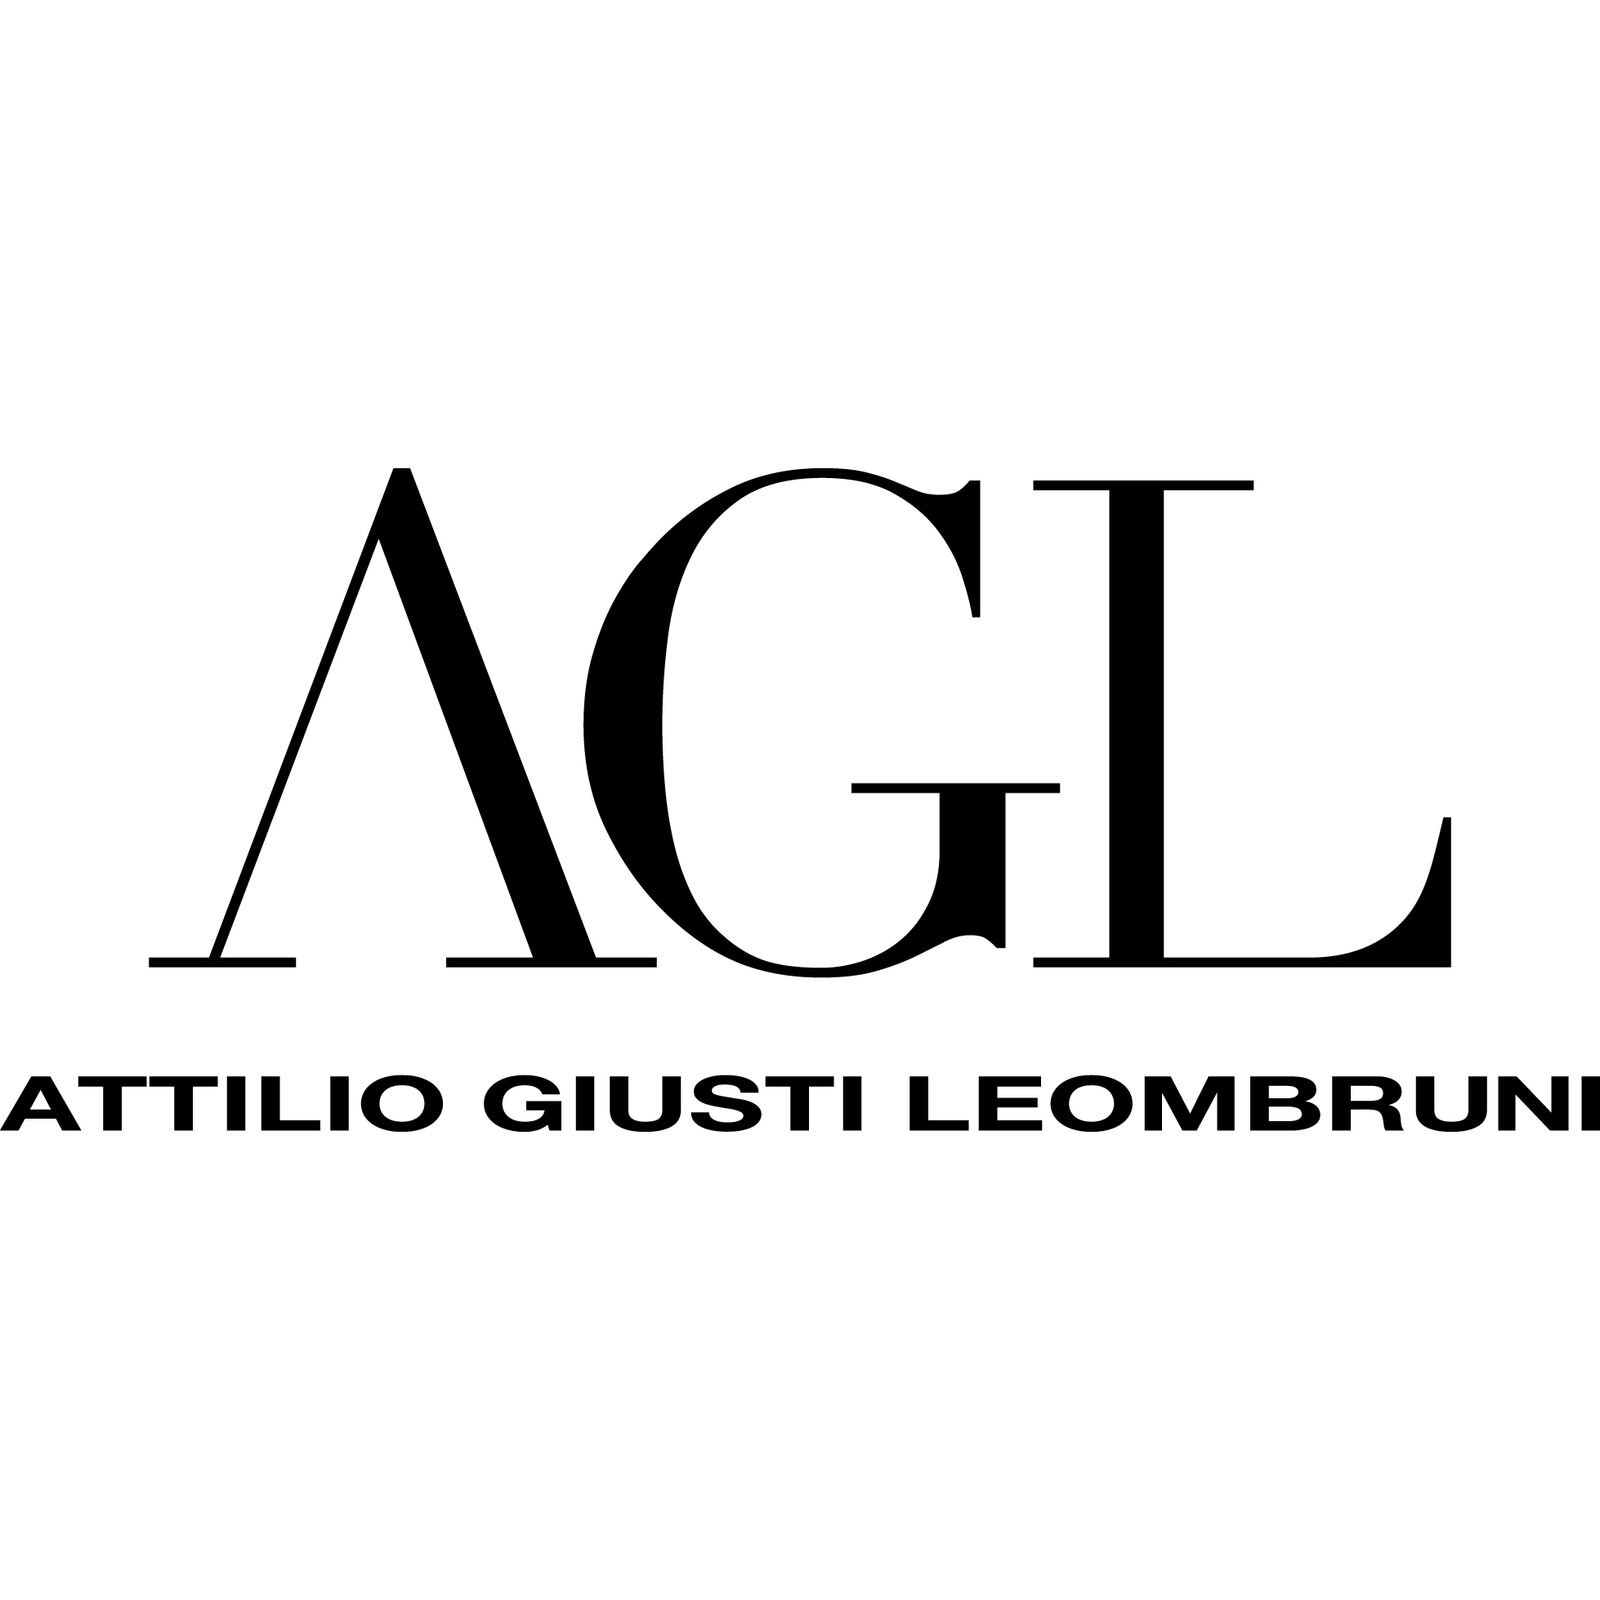 AGL Attilio Giusti Leombruni (Bild 1)